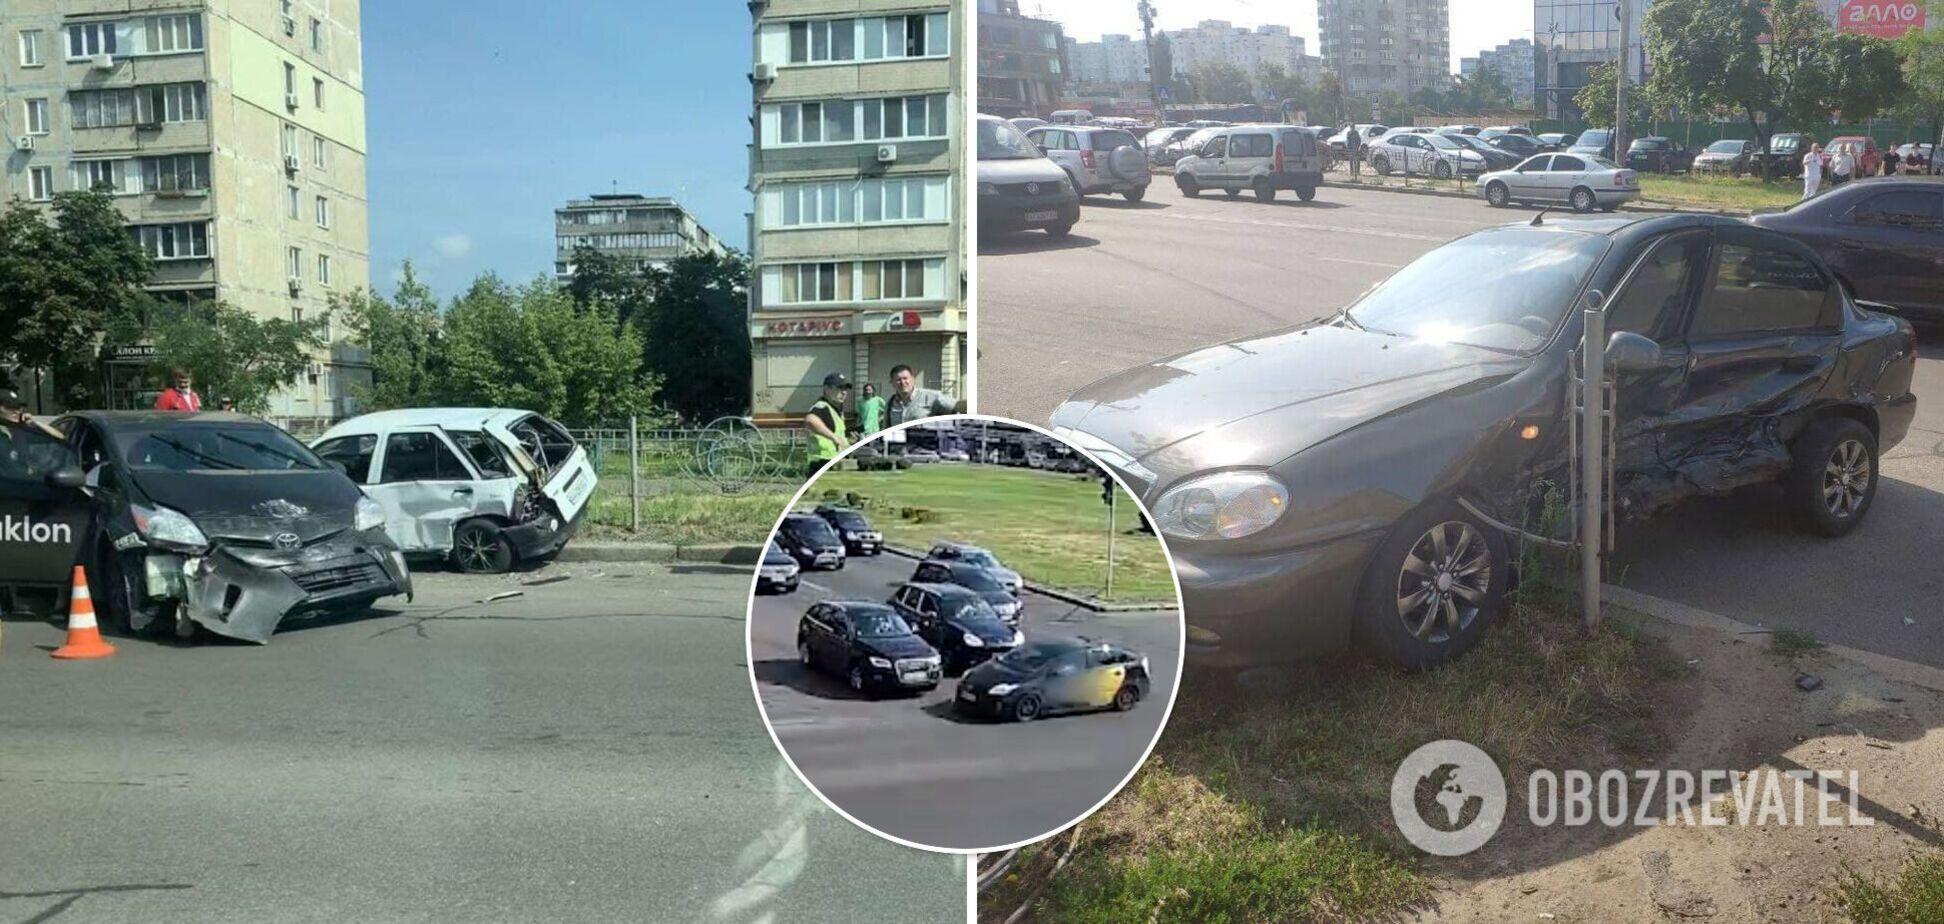 Инцидент произошел на улице Маршала Малиновского